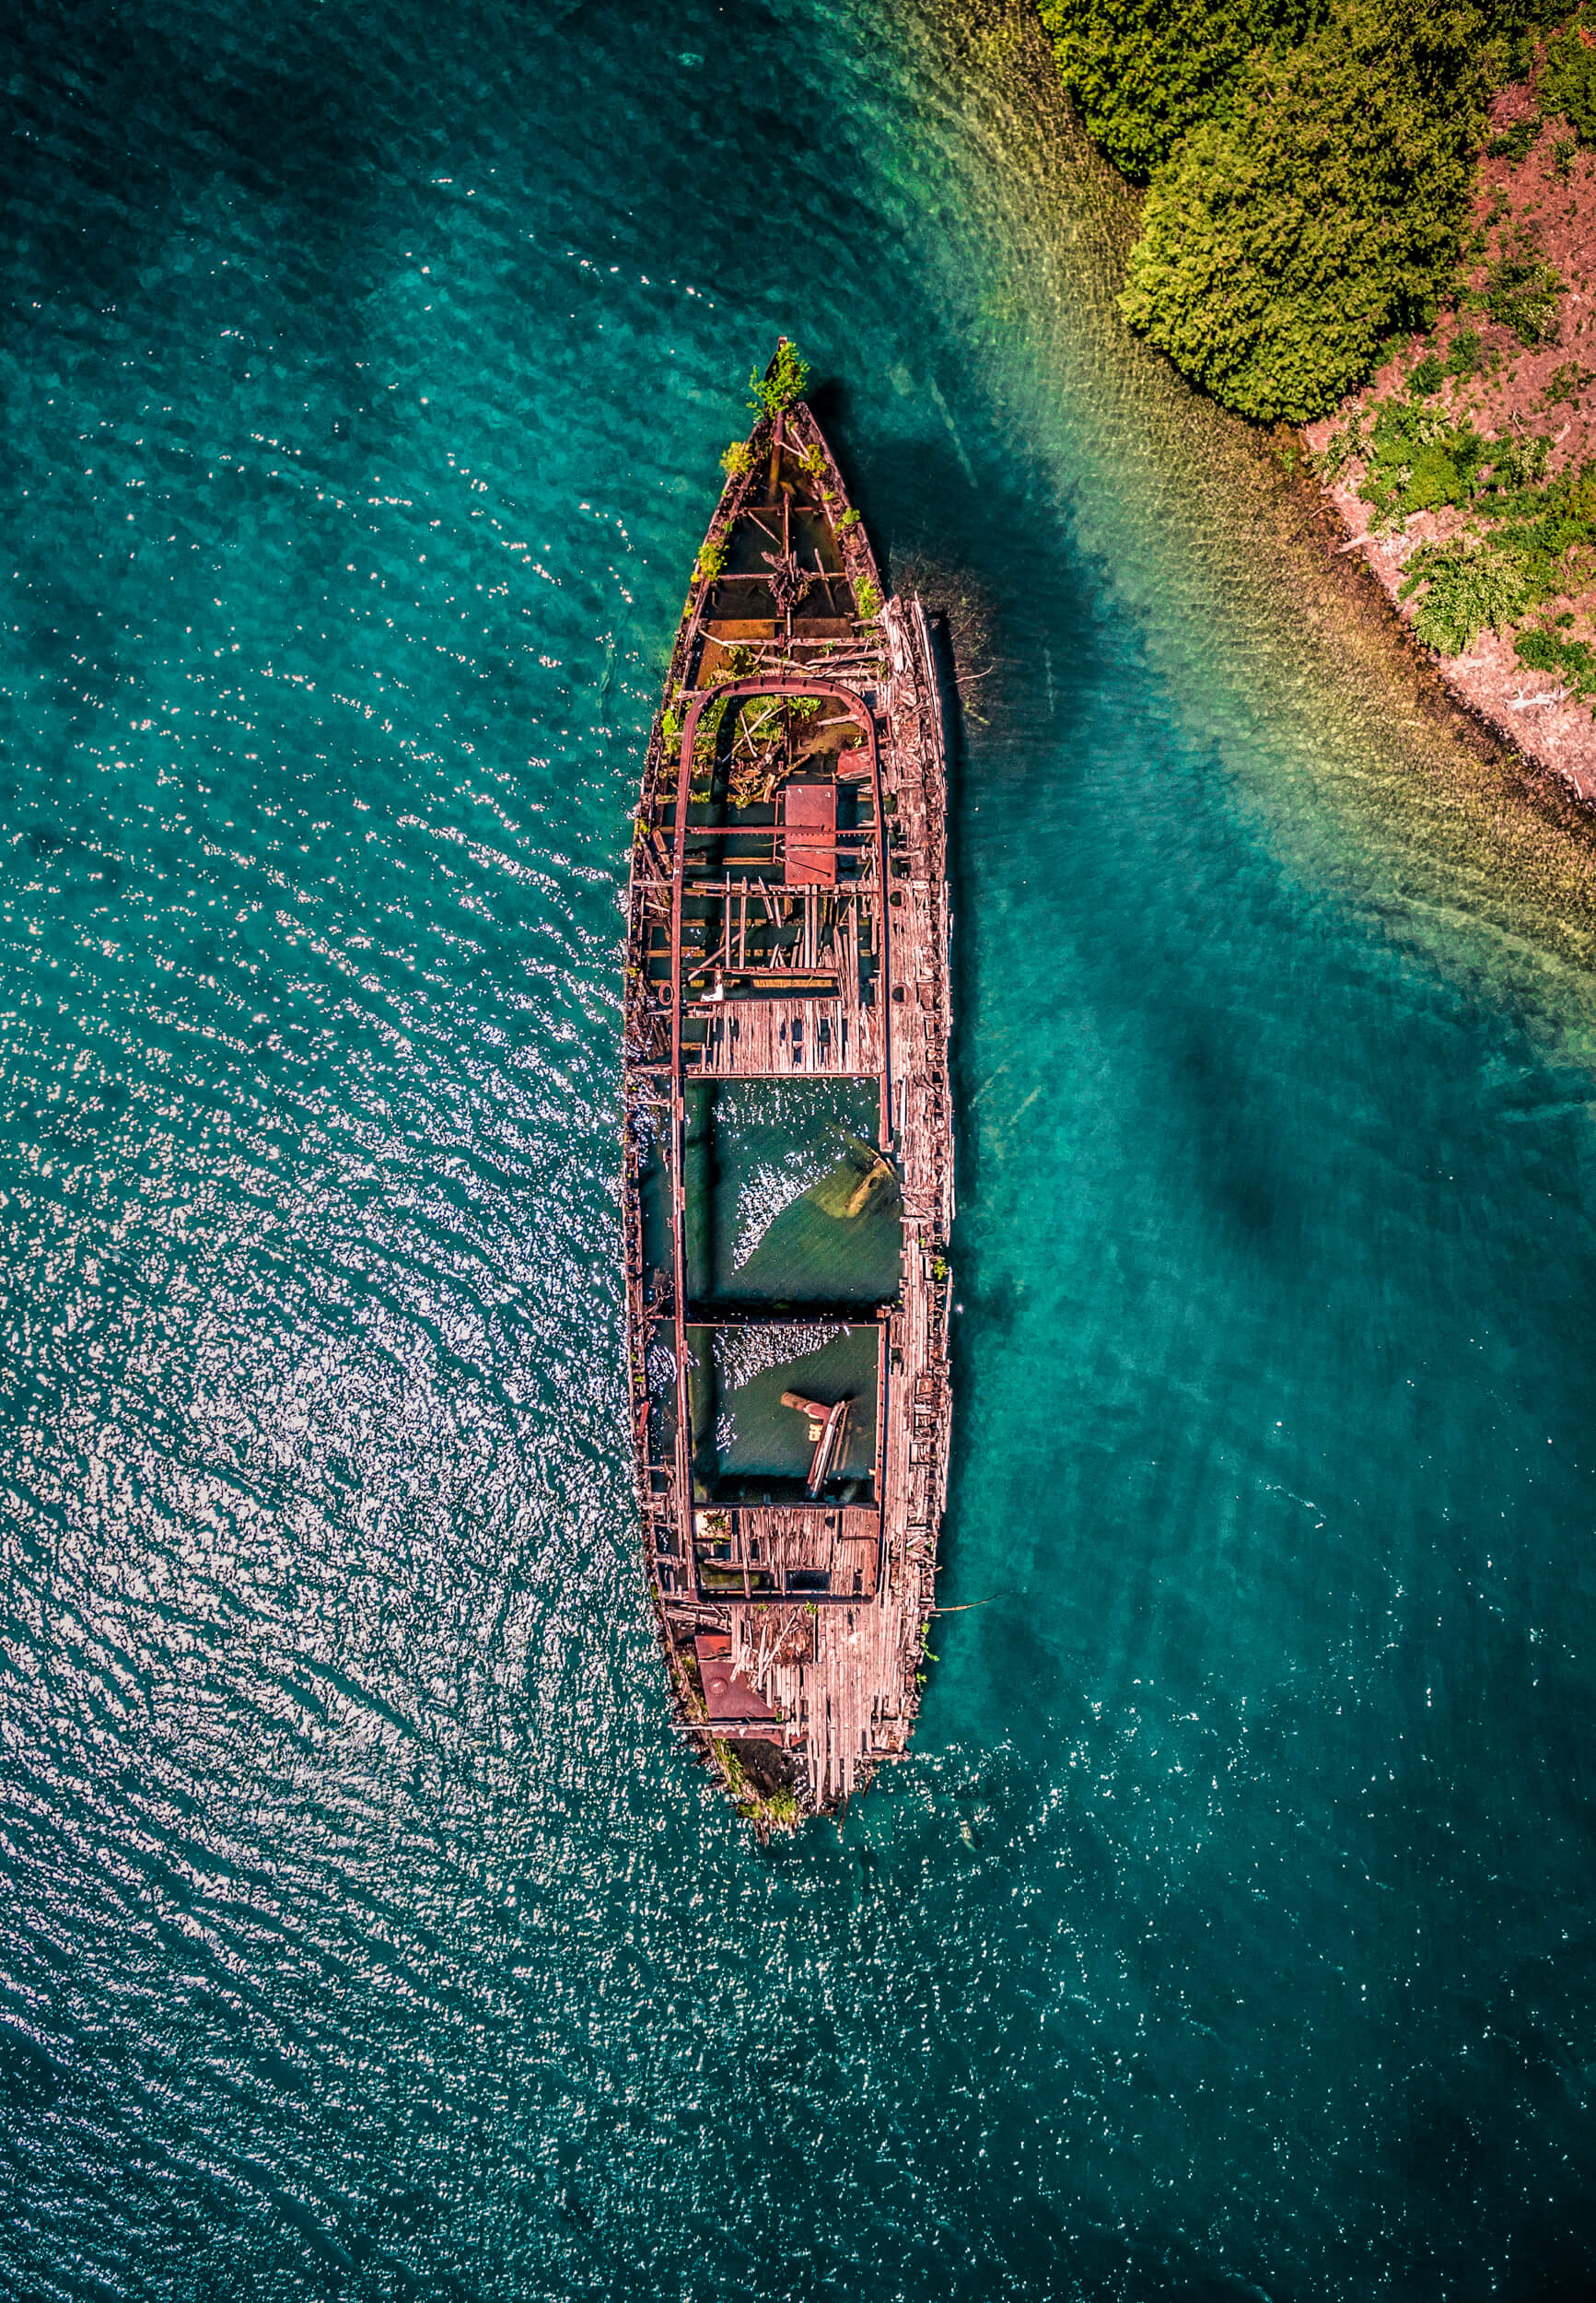 Photo: Gargantua Shipwreck, Bruce Peninsula, Ontario, Canada – Inspire 1 and Zenmuse X3